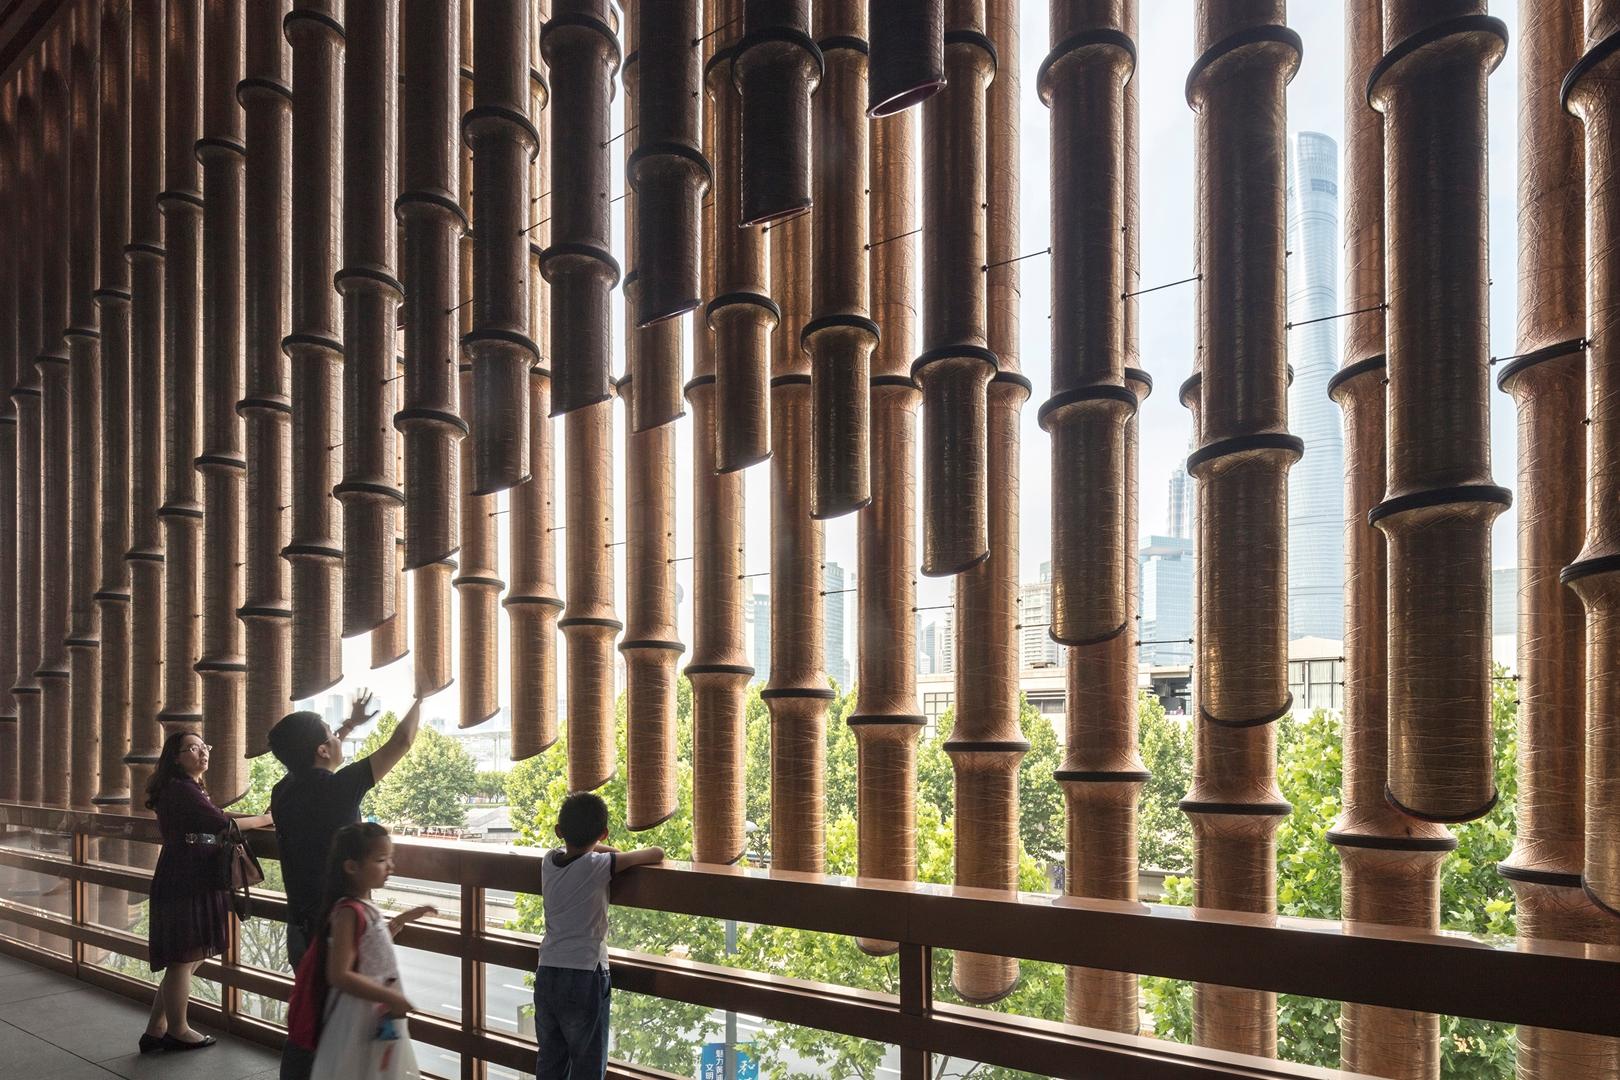 581_Inside the terrace at Fosun Foundation_Bund Finance Centre_CREDIT_Laurian Ghinitoiu (Copy)